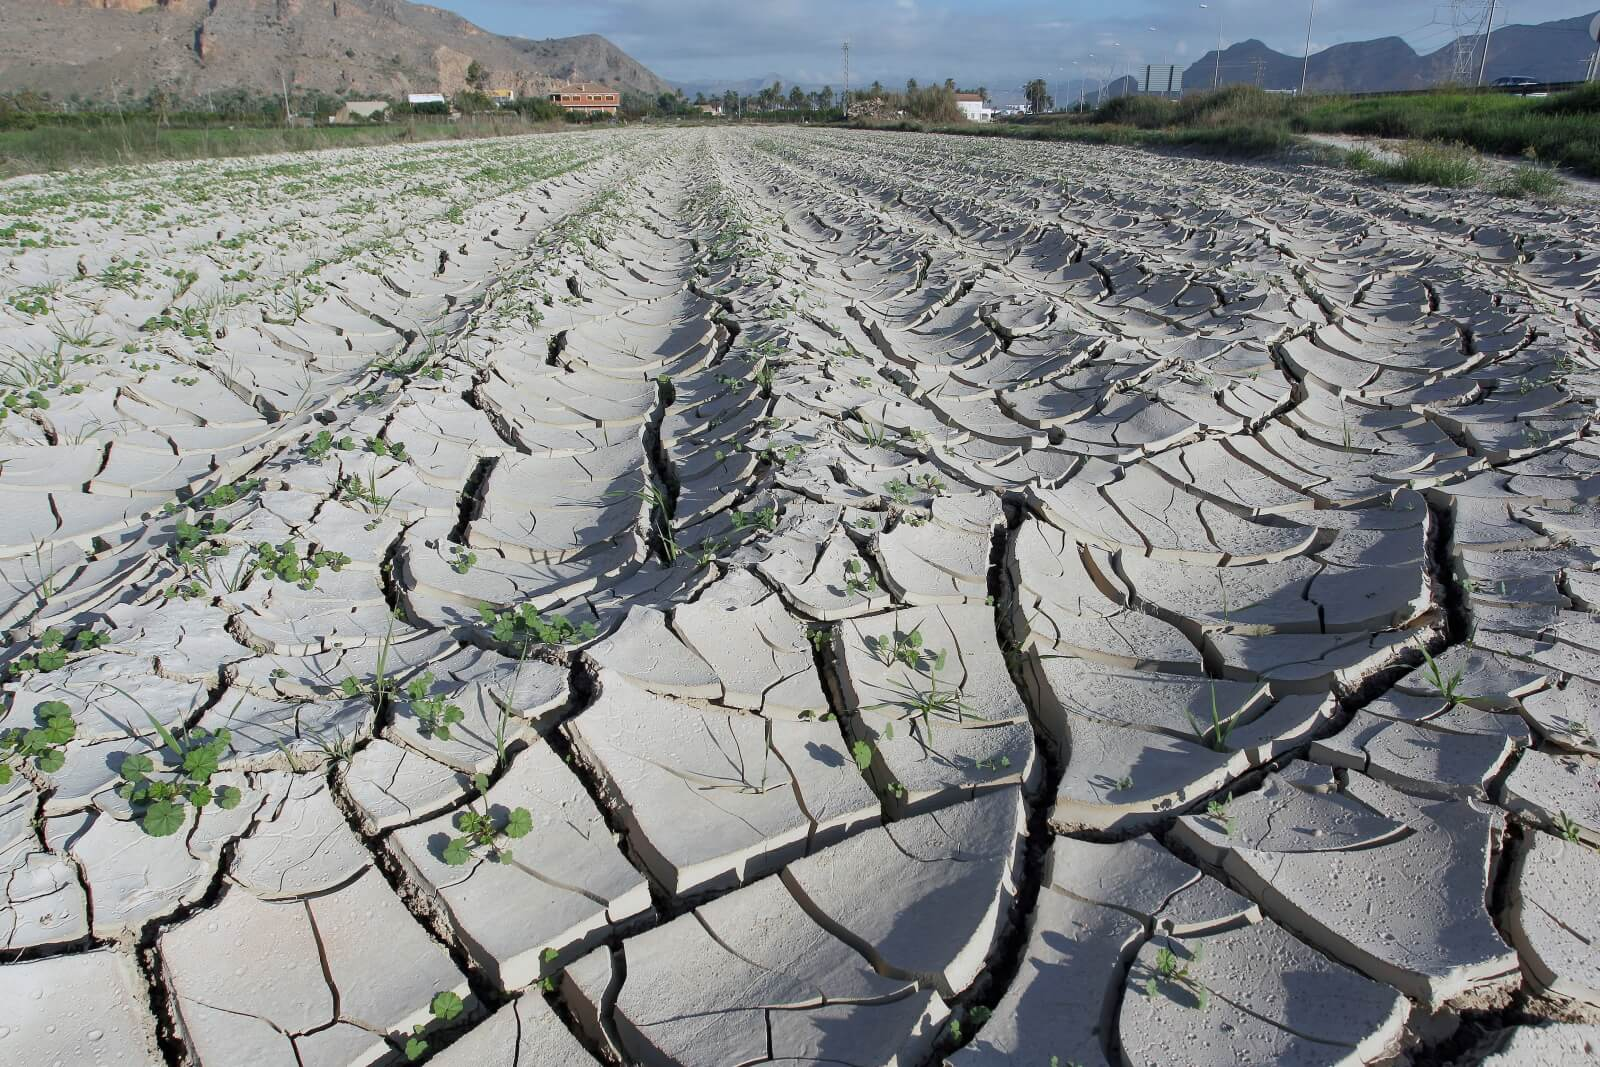 Susza w Hiszpanii fot. EPA/MORELL